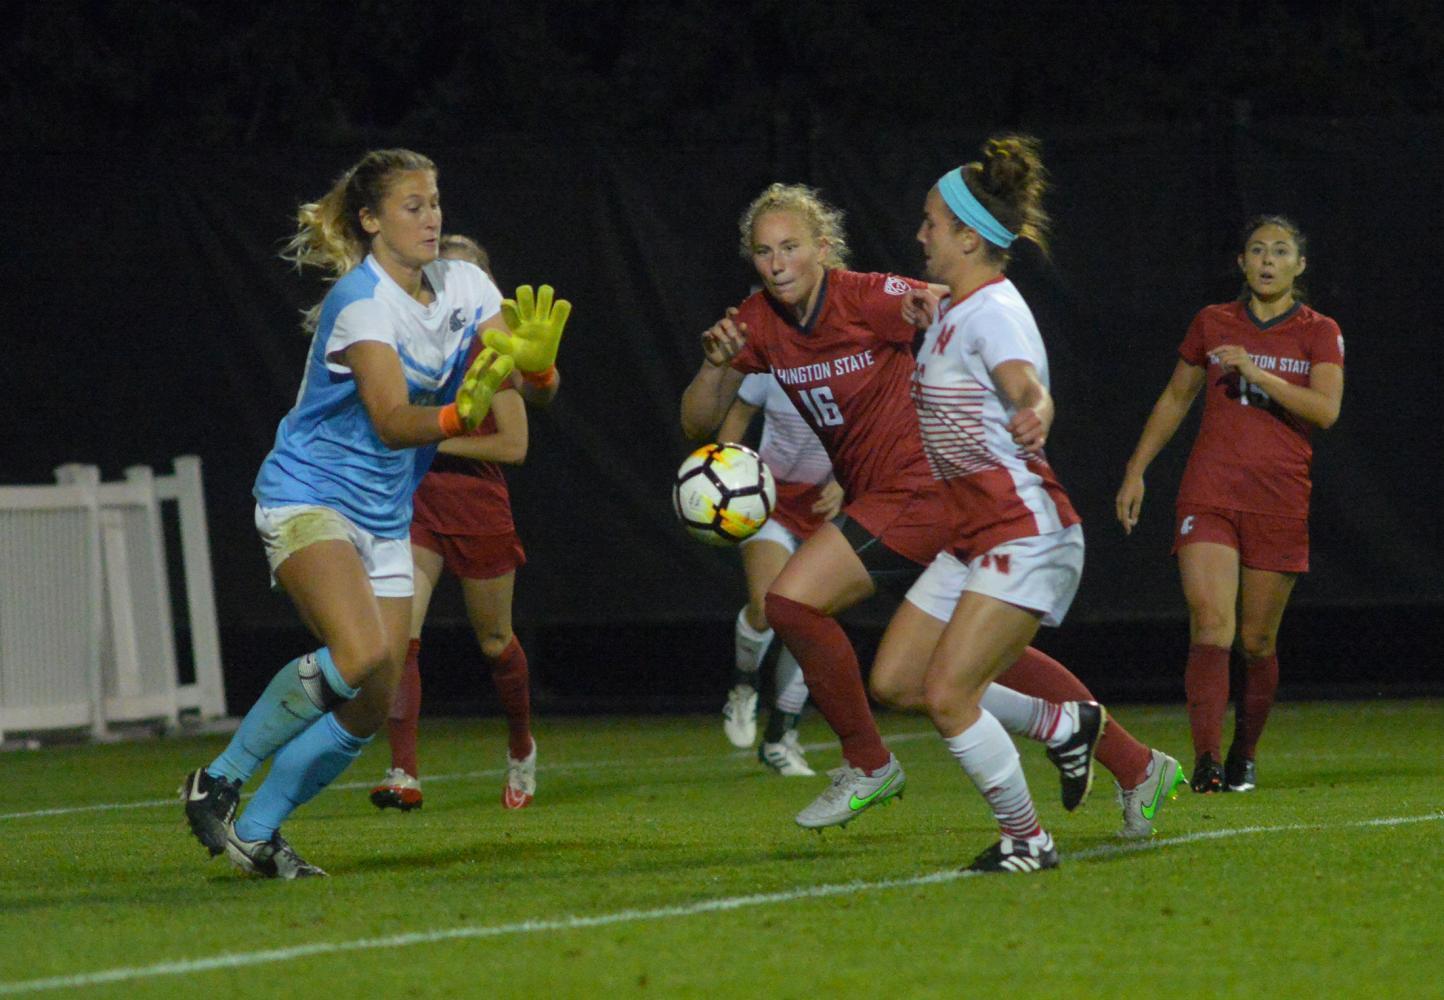 Then-redshirt junior goalkeeper Ella Dederick makes a save during a game against No. 14 Nebraska on Sept. 1, 2017.